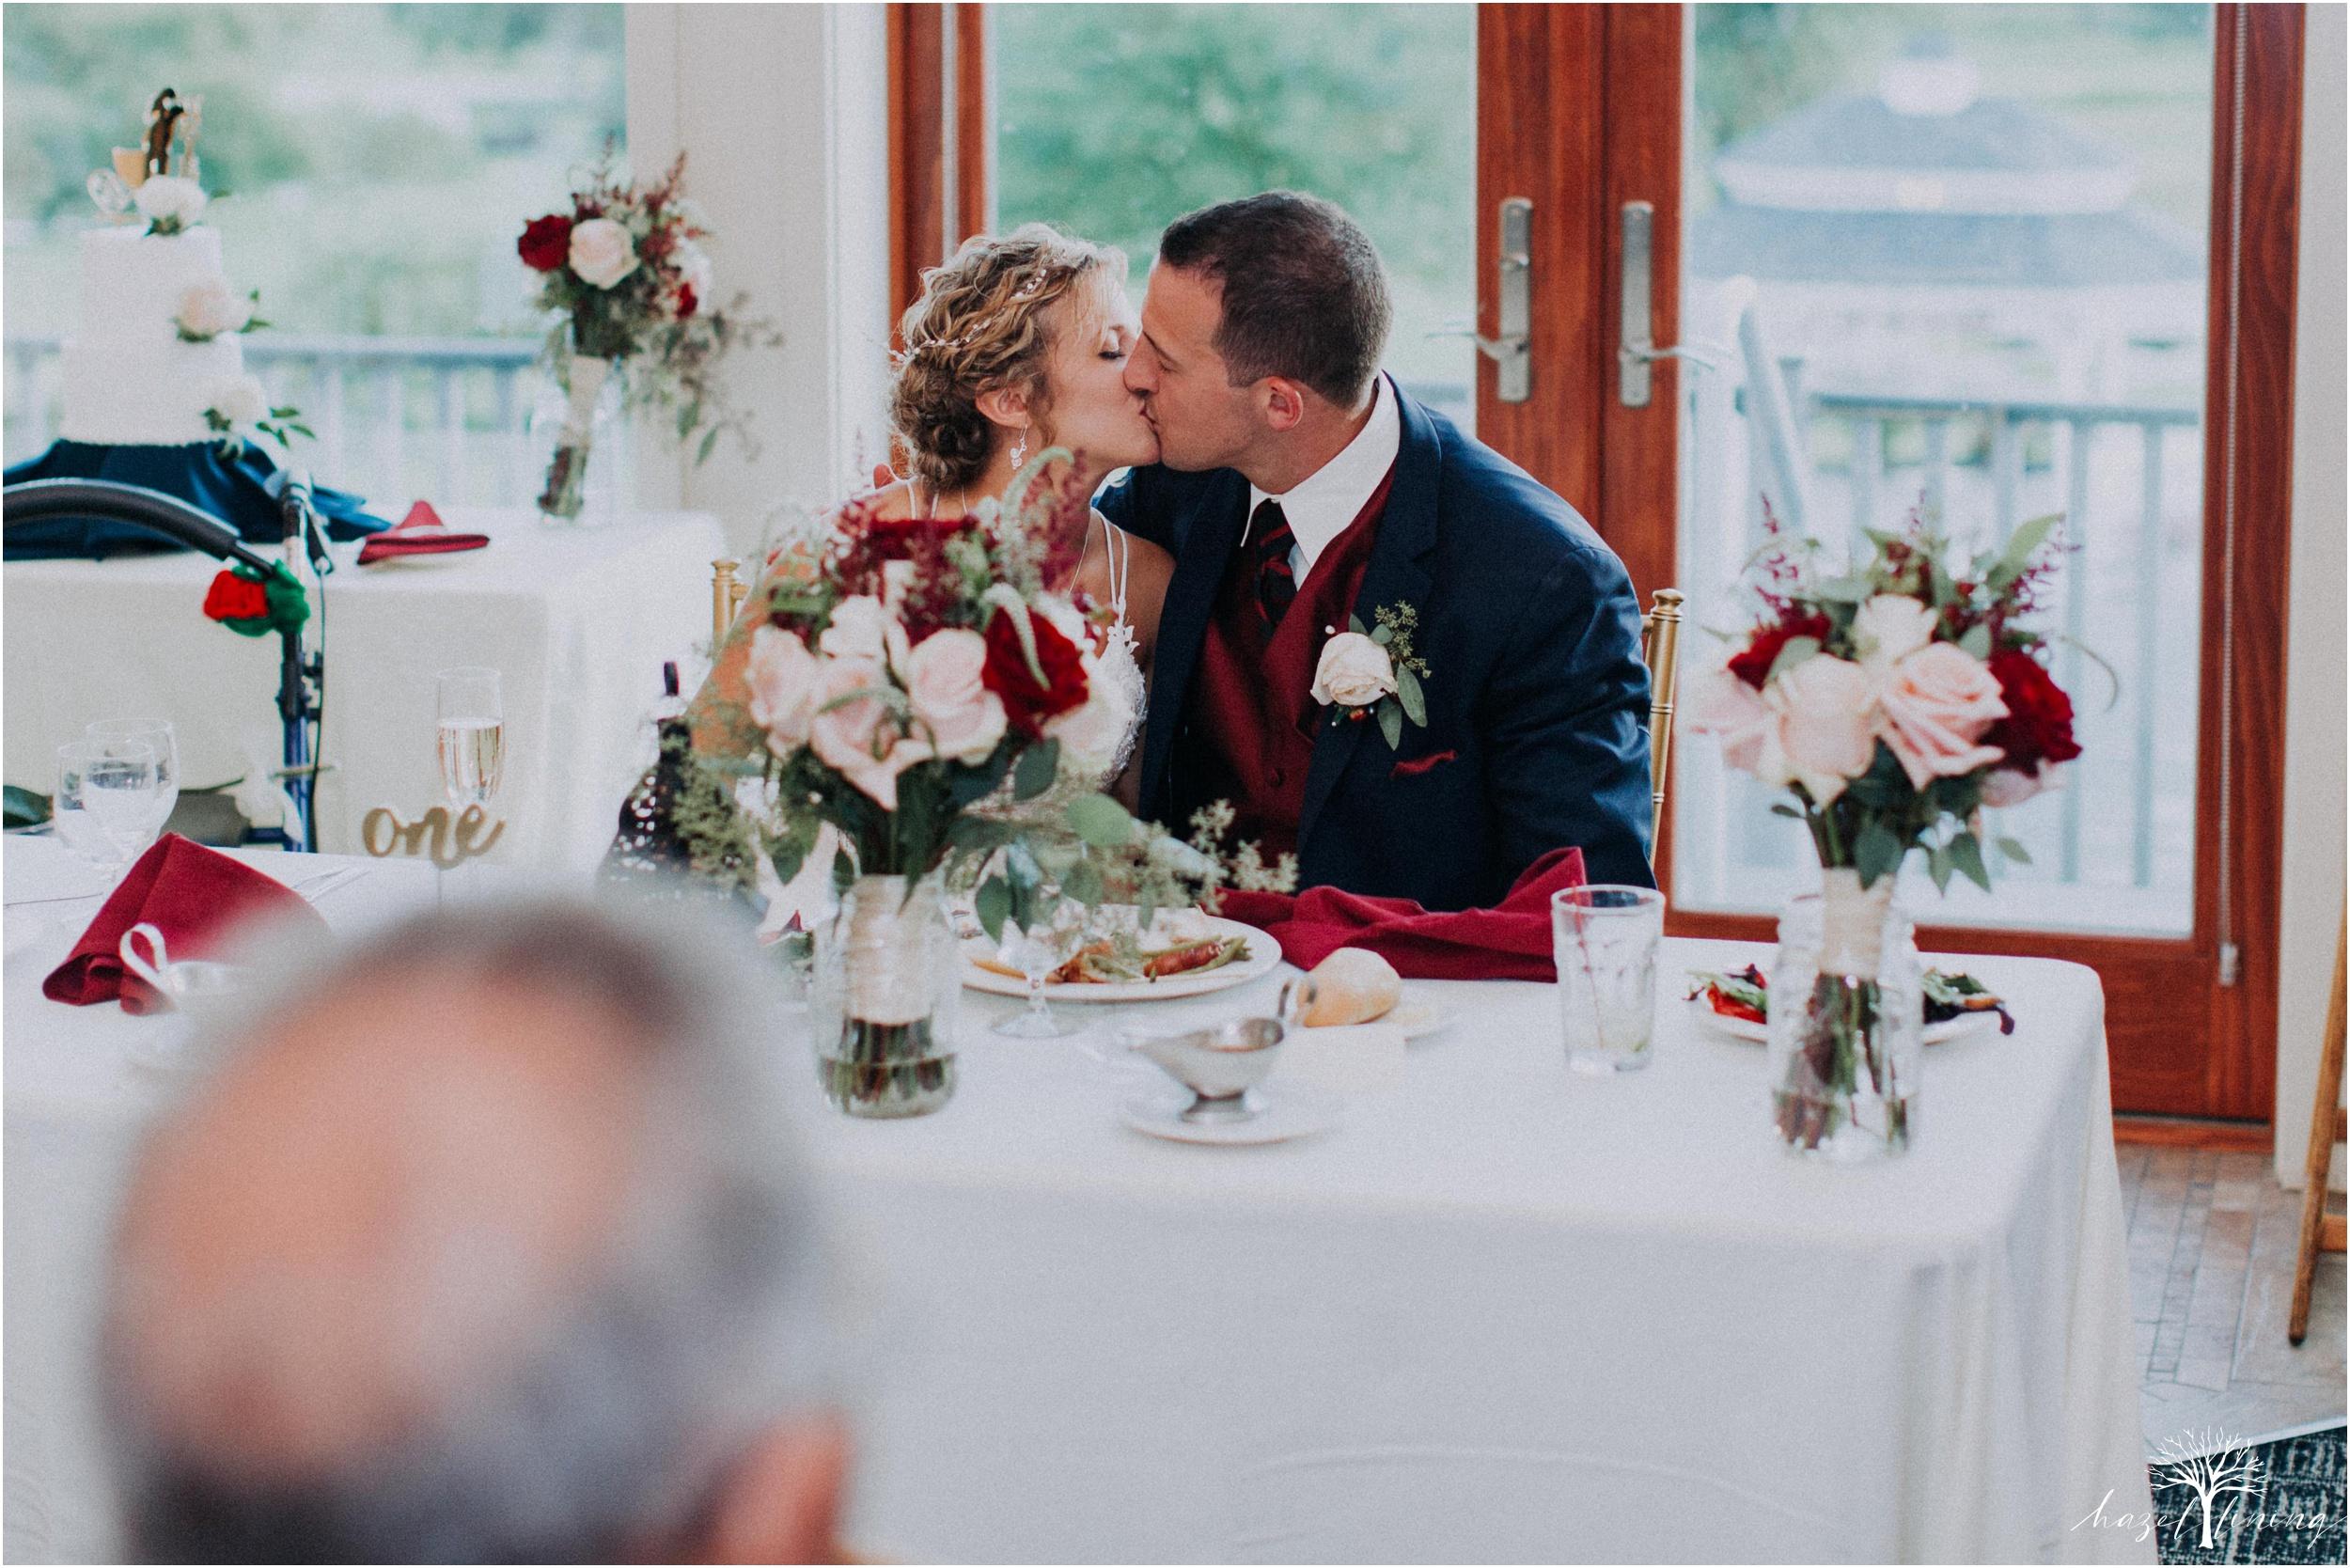 jonathan-weibel-becky-haywood-loft-at-sweetwater-cc-pennsburg-pennsylvania-rainy-day-summer-wedding-hazel-lining-travel-wedding-elopement-photography_0118.jpg